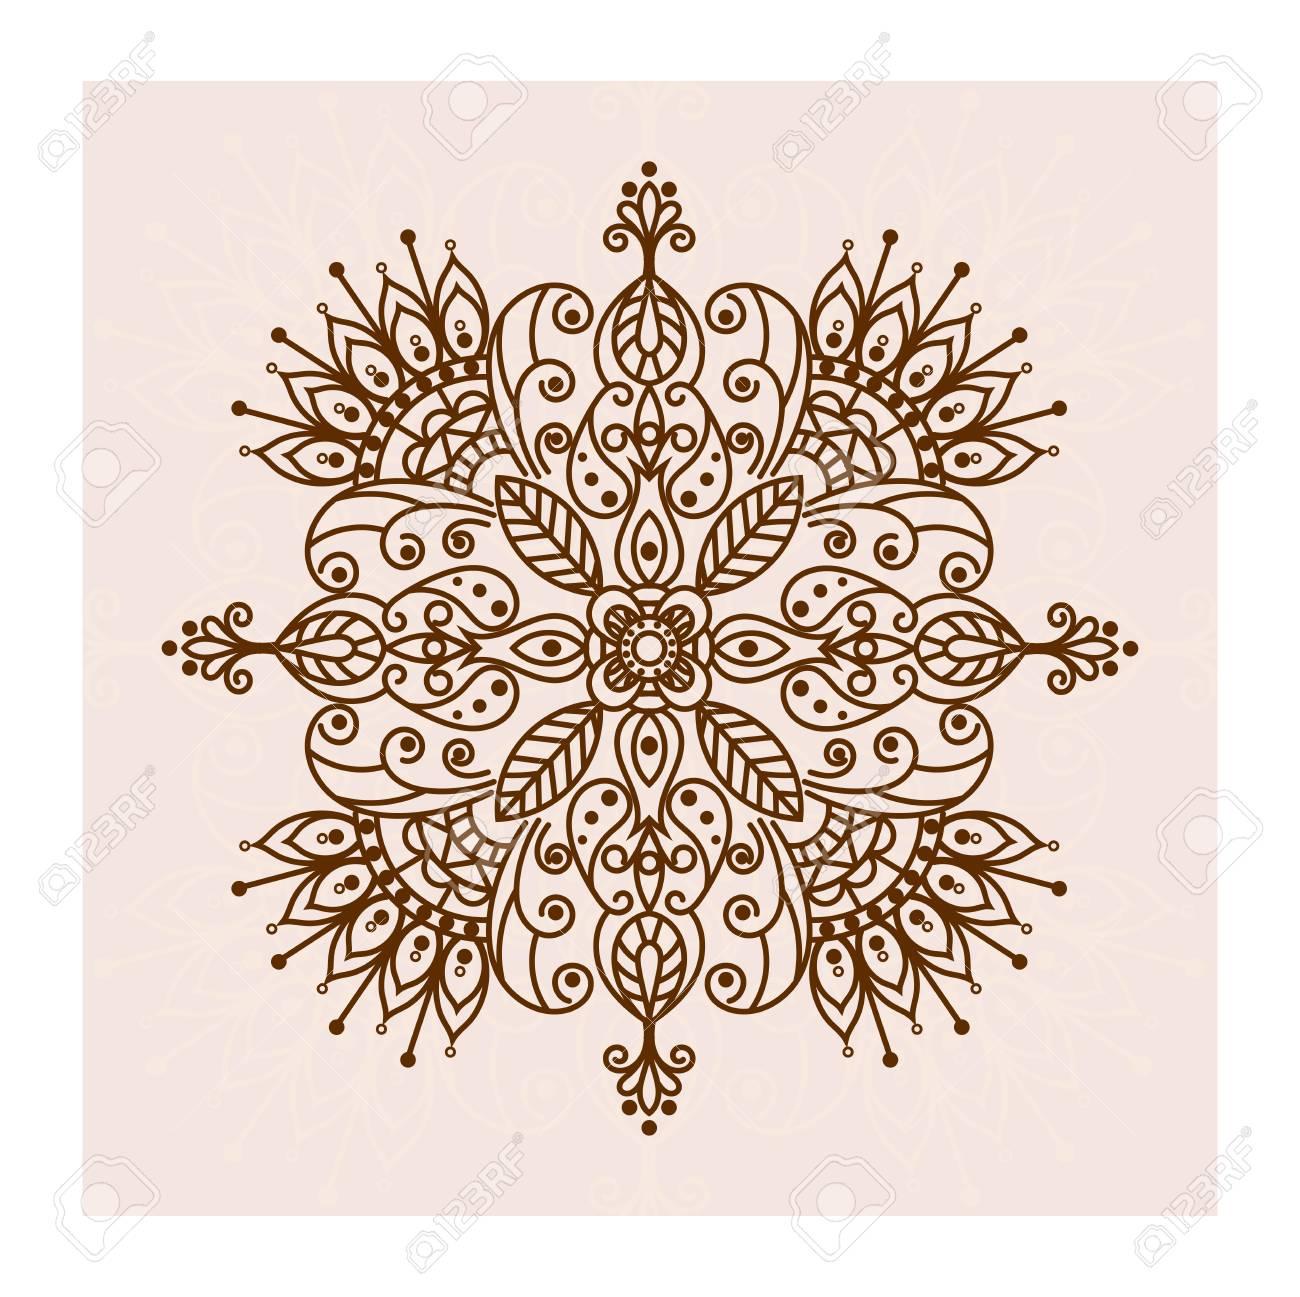 Mandala Henna Flower Ethnic Lace Ornamental Pattern Can Be